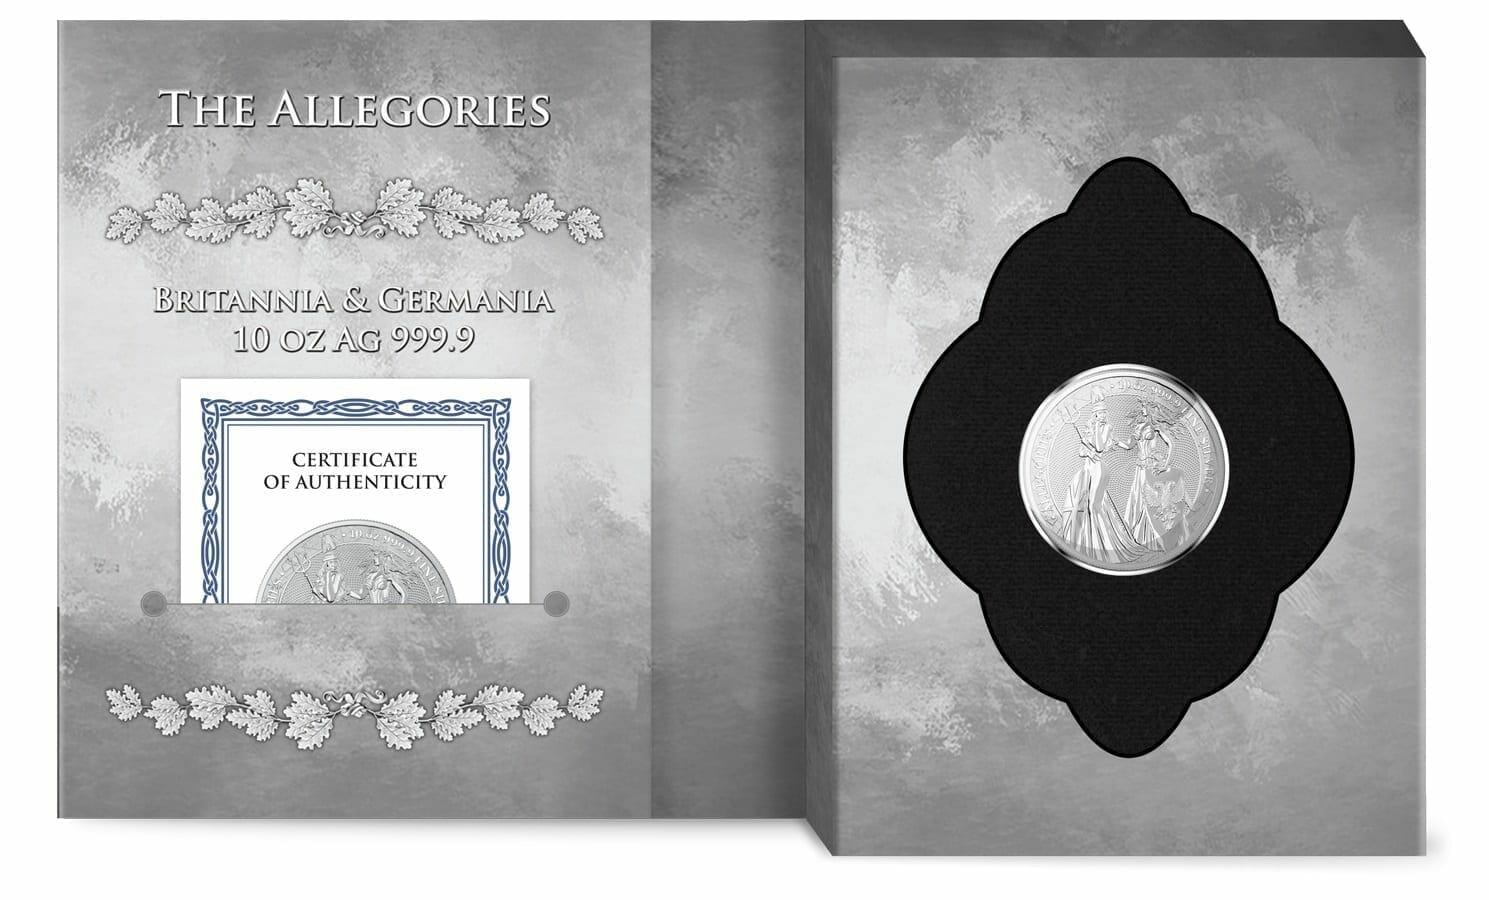 2019 The Allegories - Britannia & Germania 10oz .9999 Silver Coin 4